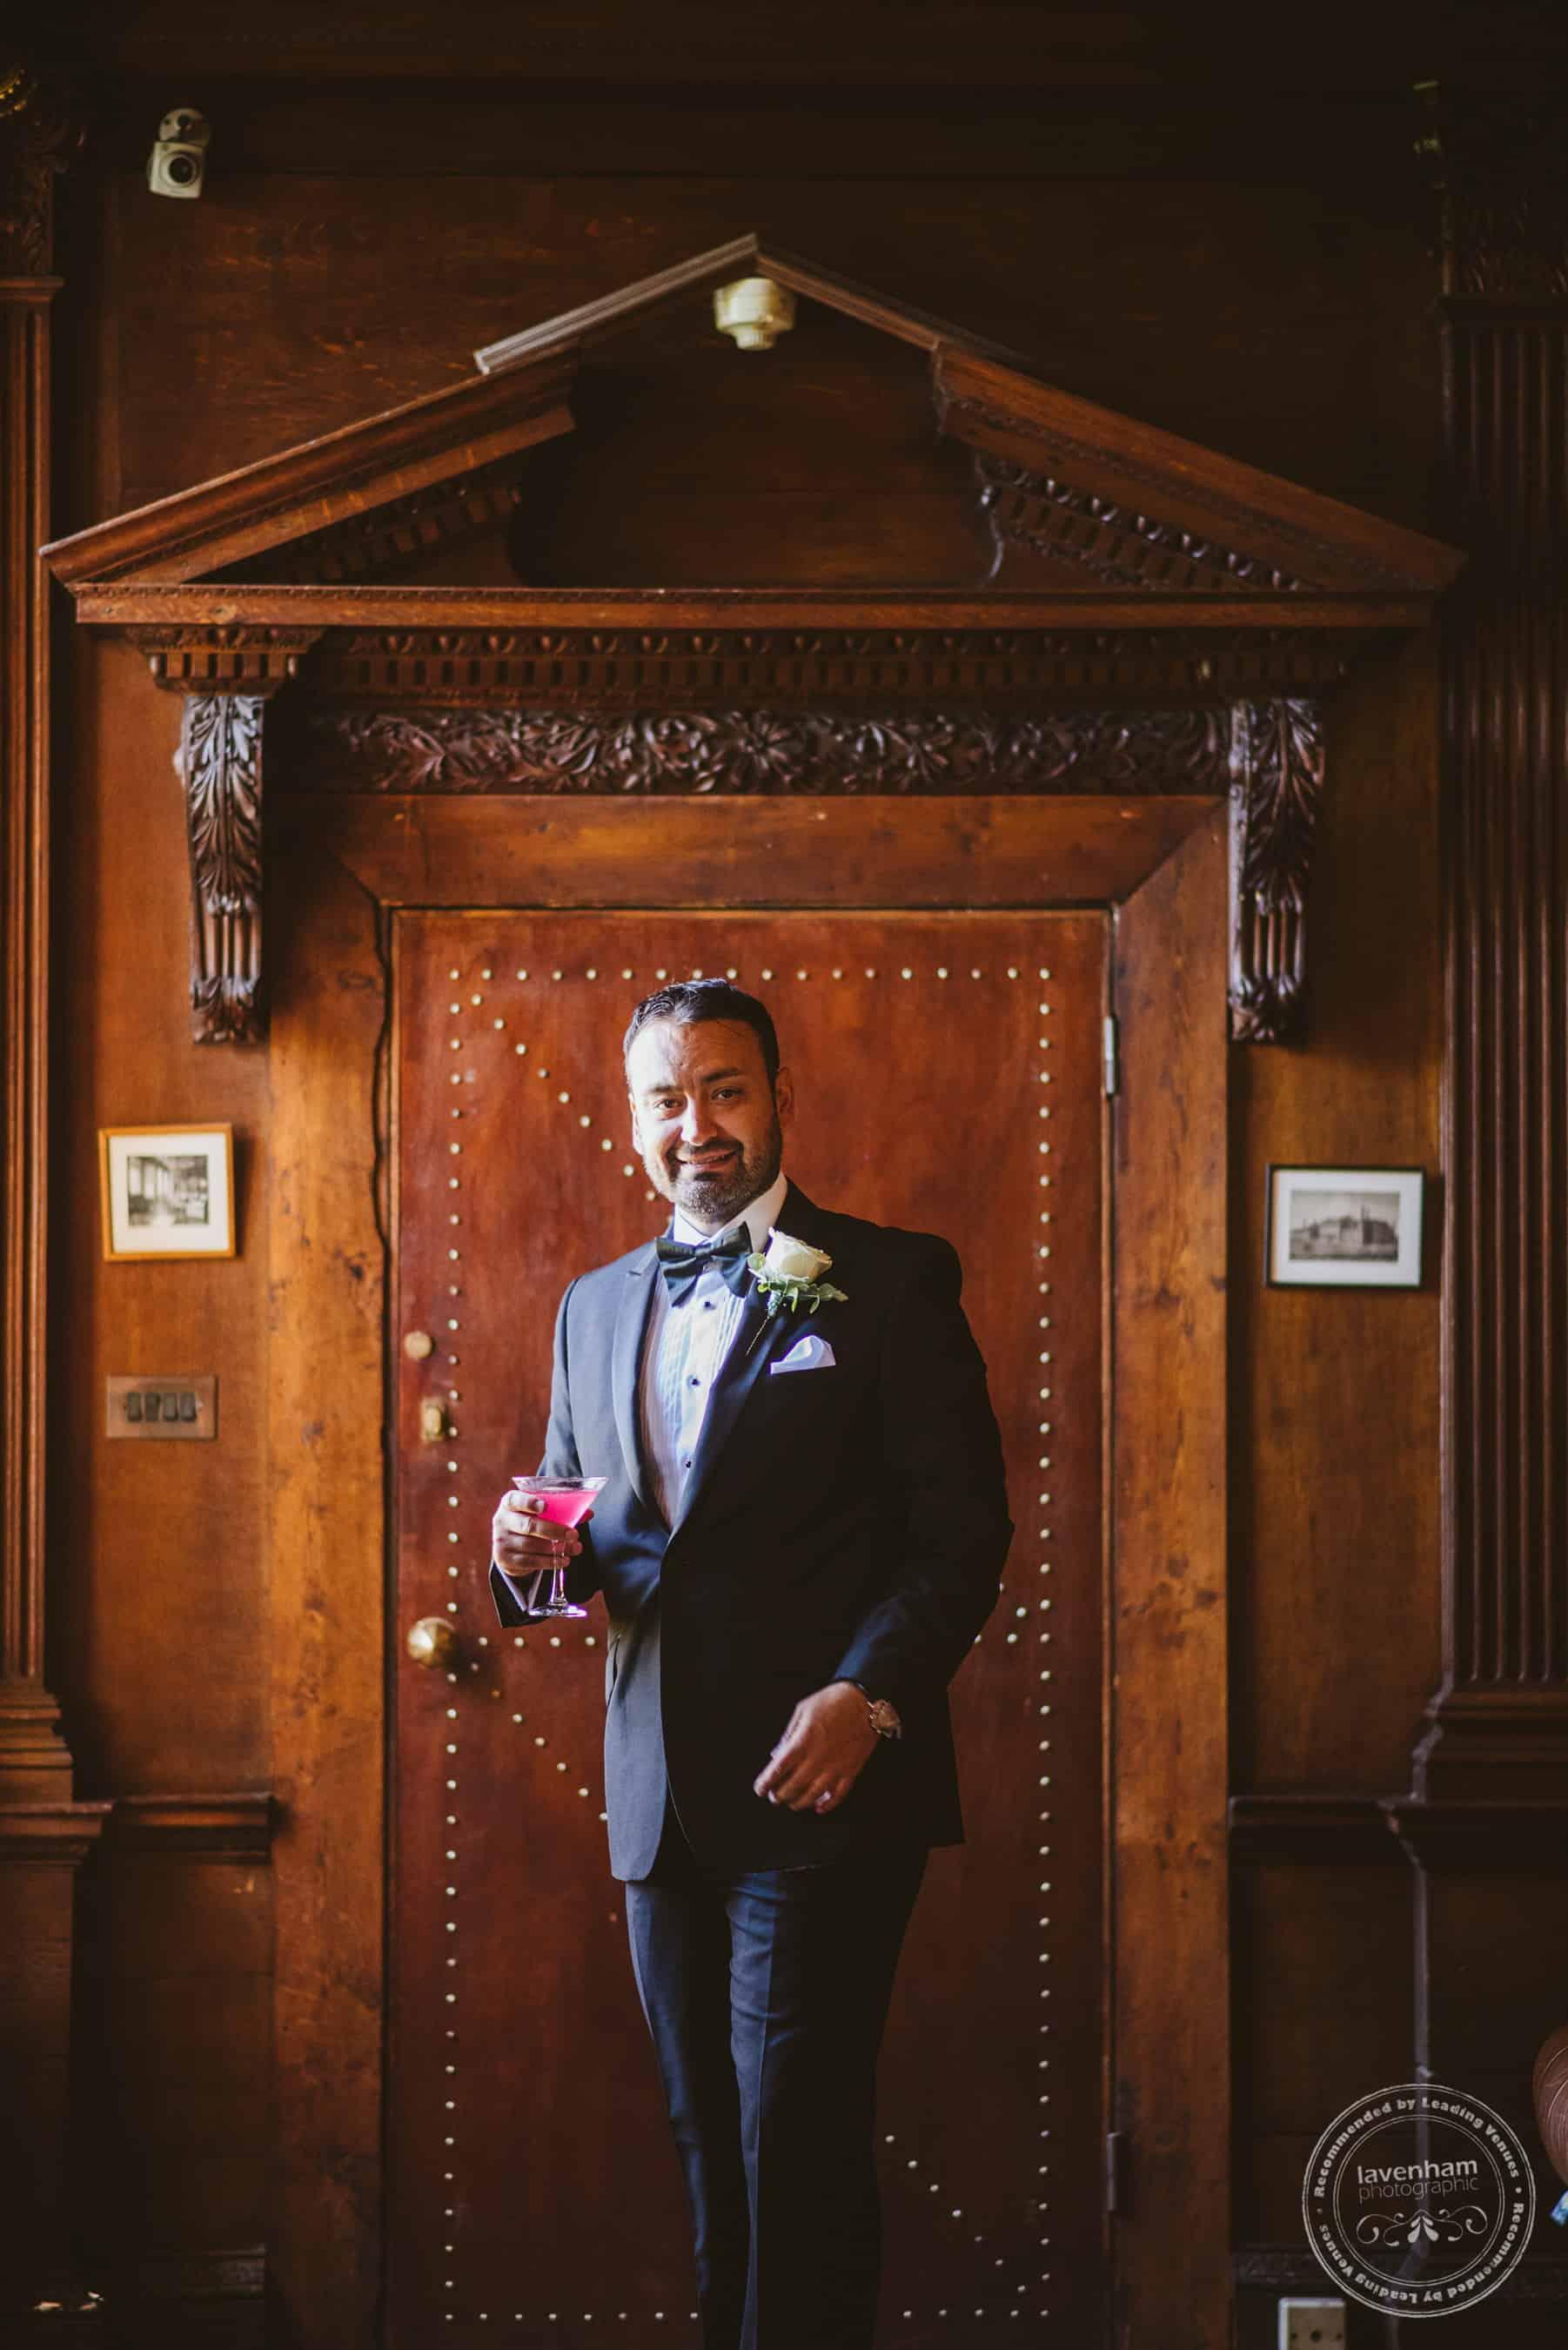 220618 Gosfield Hall Wedding Photography Lavenham Photographic 0021